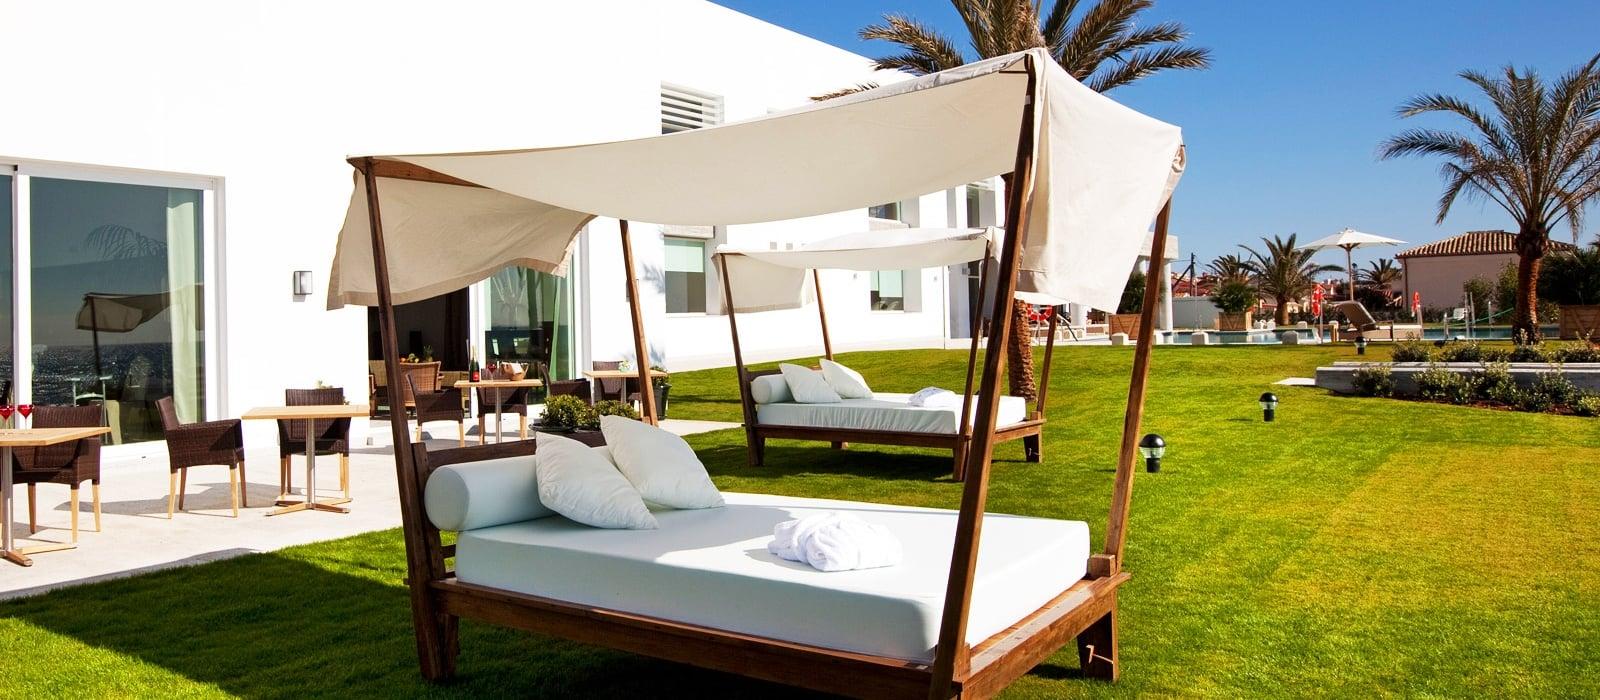 Beach Club Hotel Vincci Estrella de Mar - Gardens and Pools